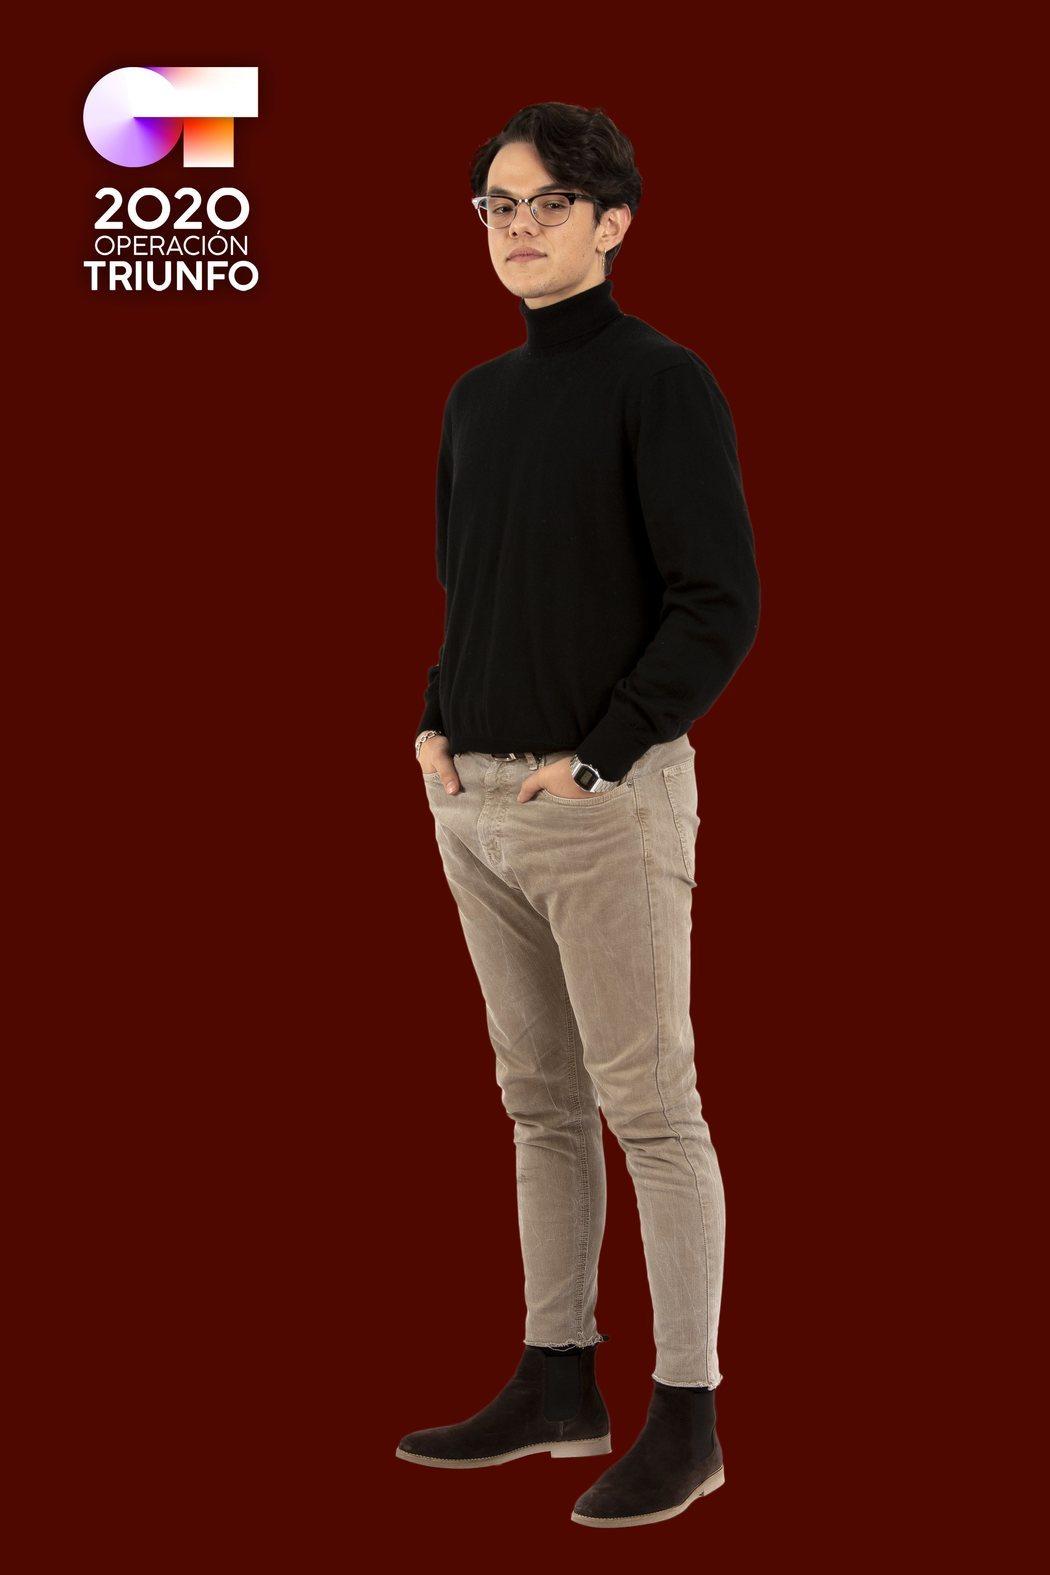 Posado de Flavio Fernández, concursante de 'OT 2020'